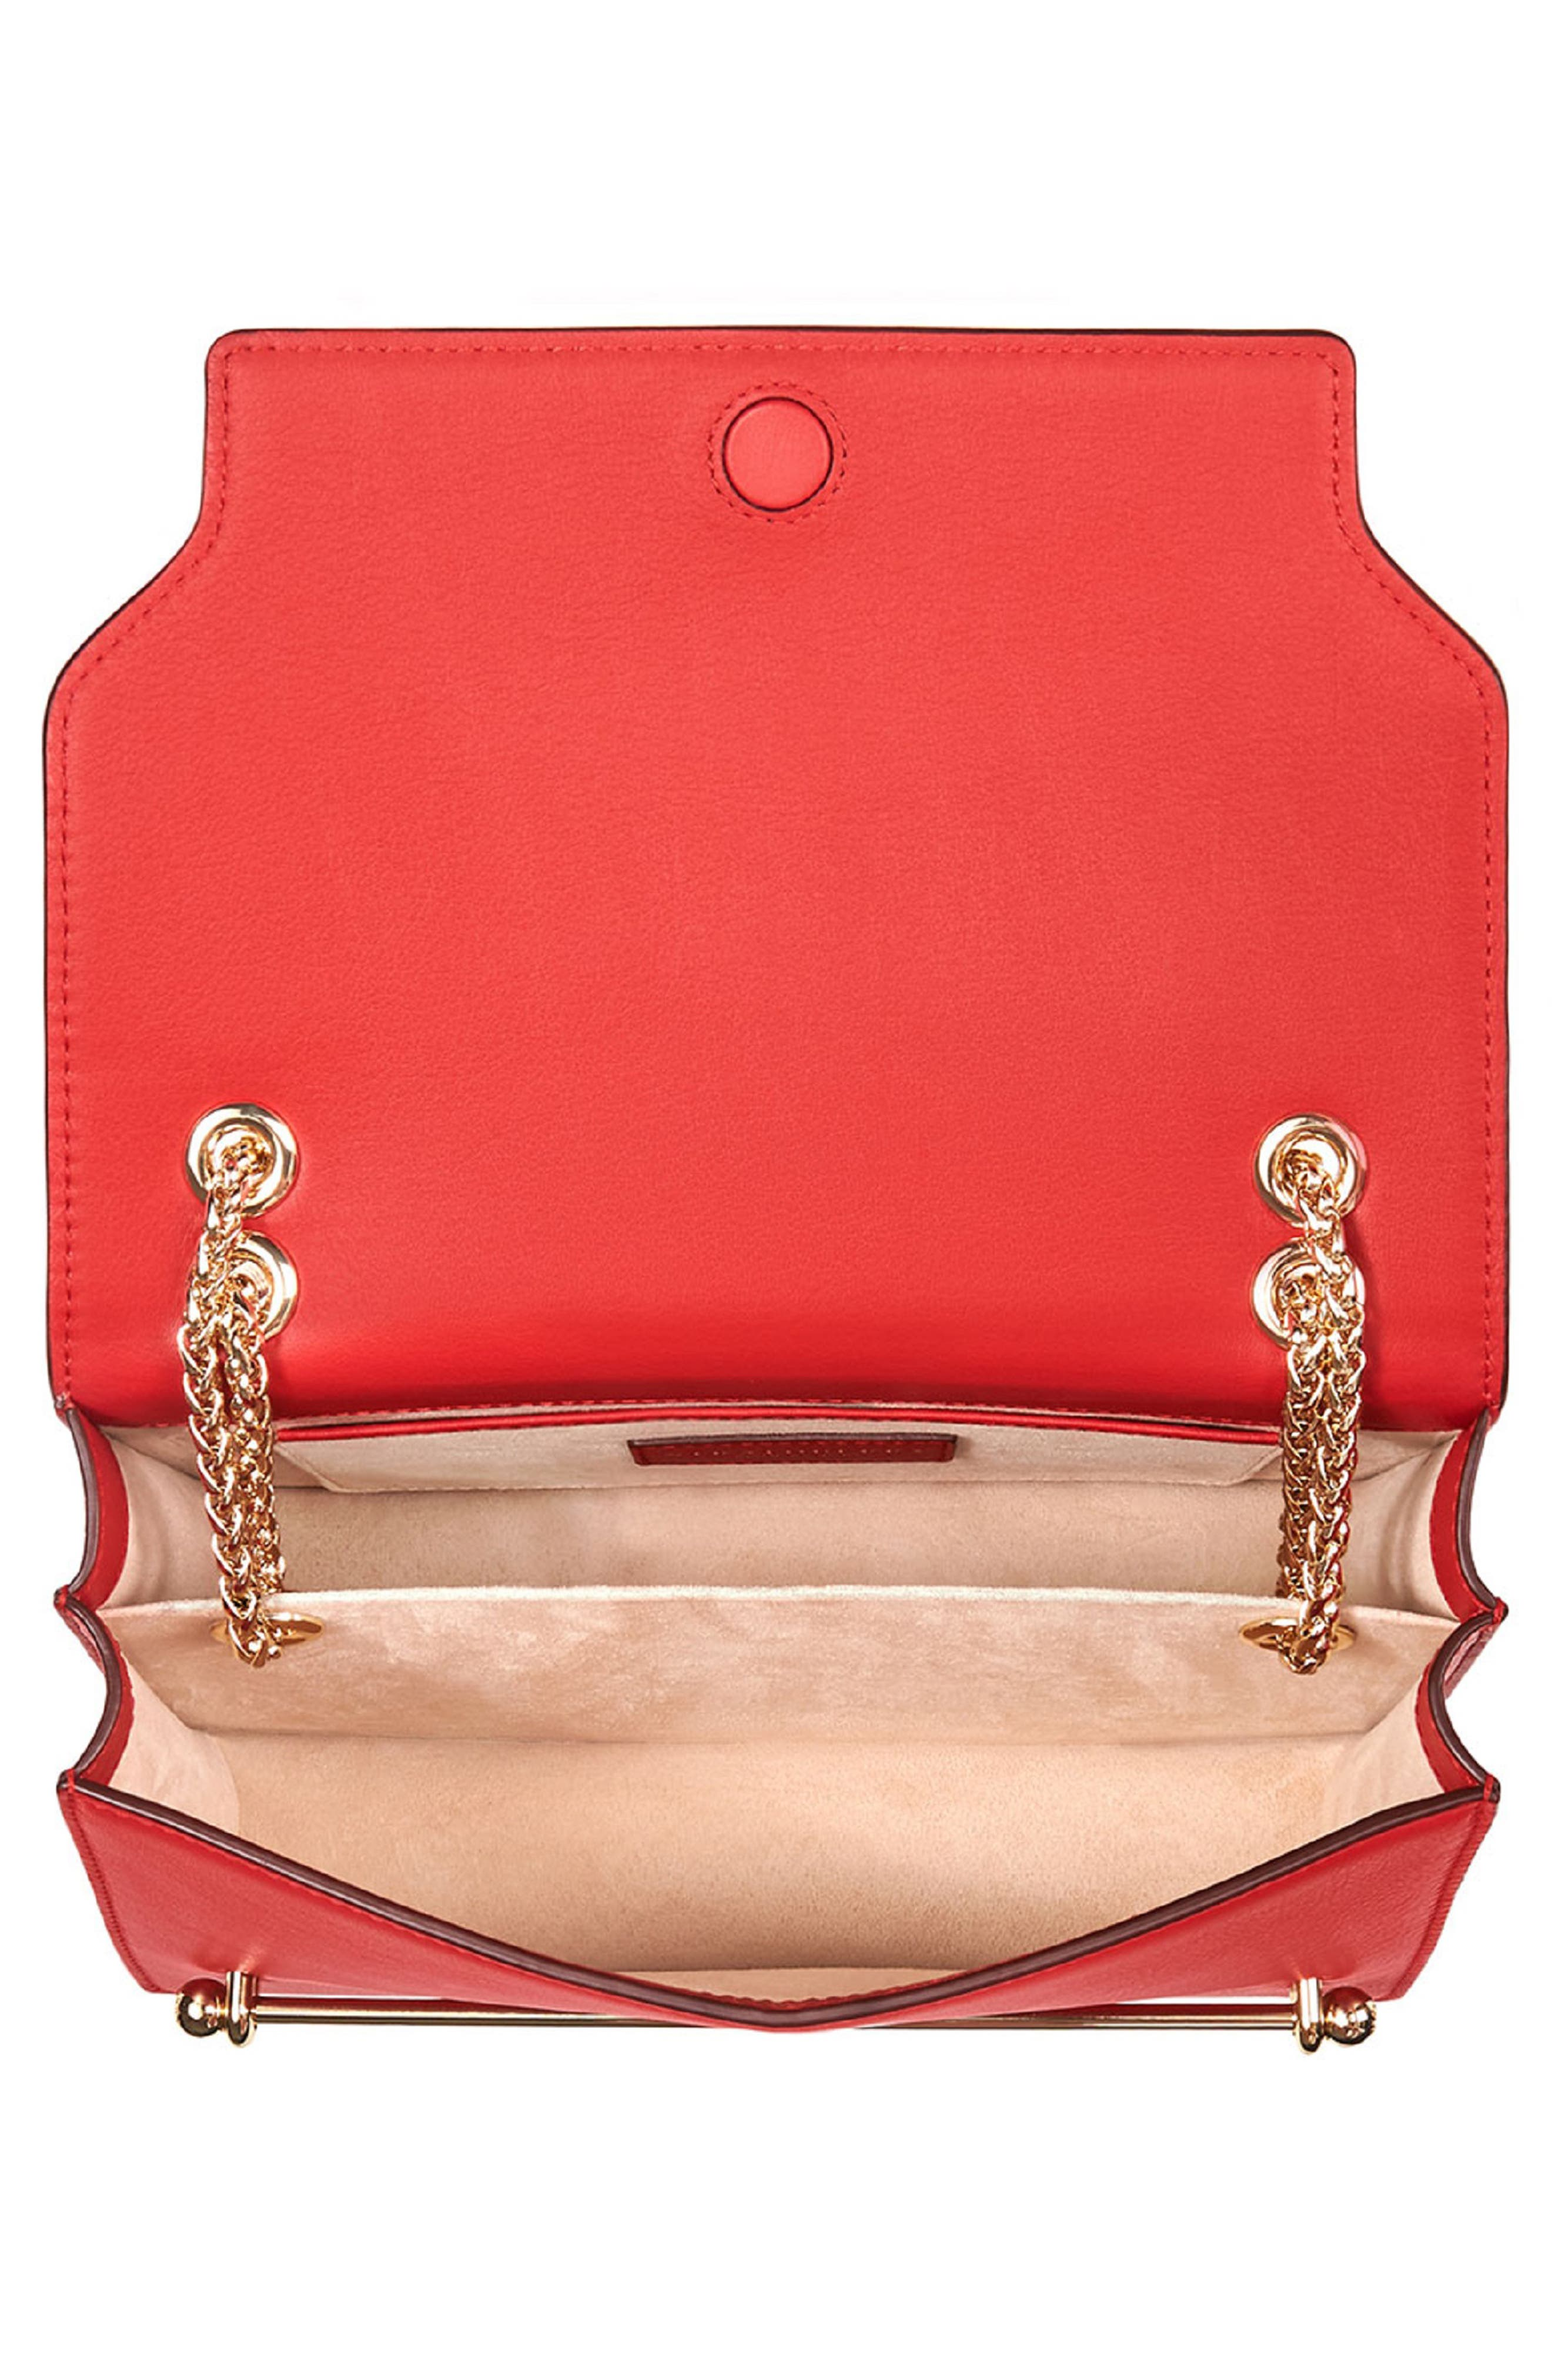 East/West Leather Crossbody Bag,                             Alternate thumbnail 13, color,